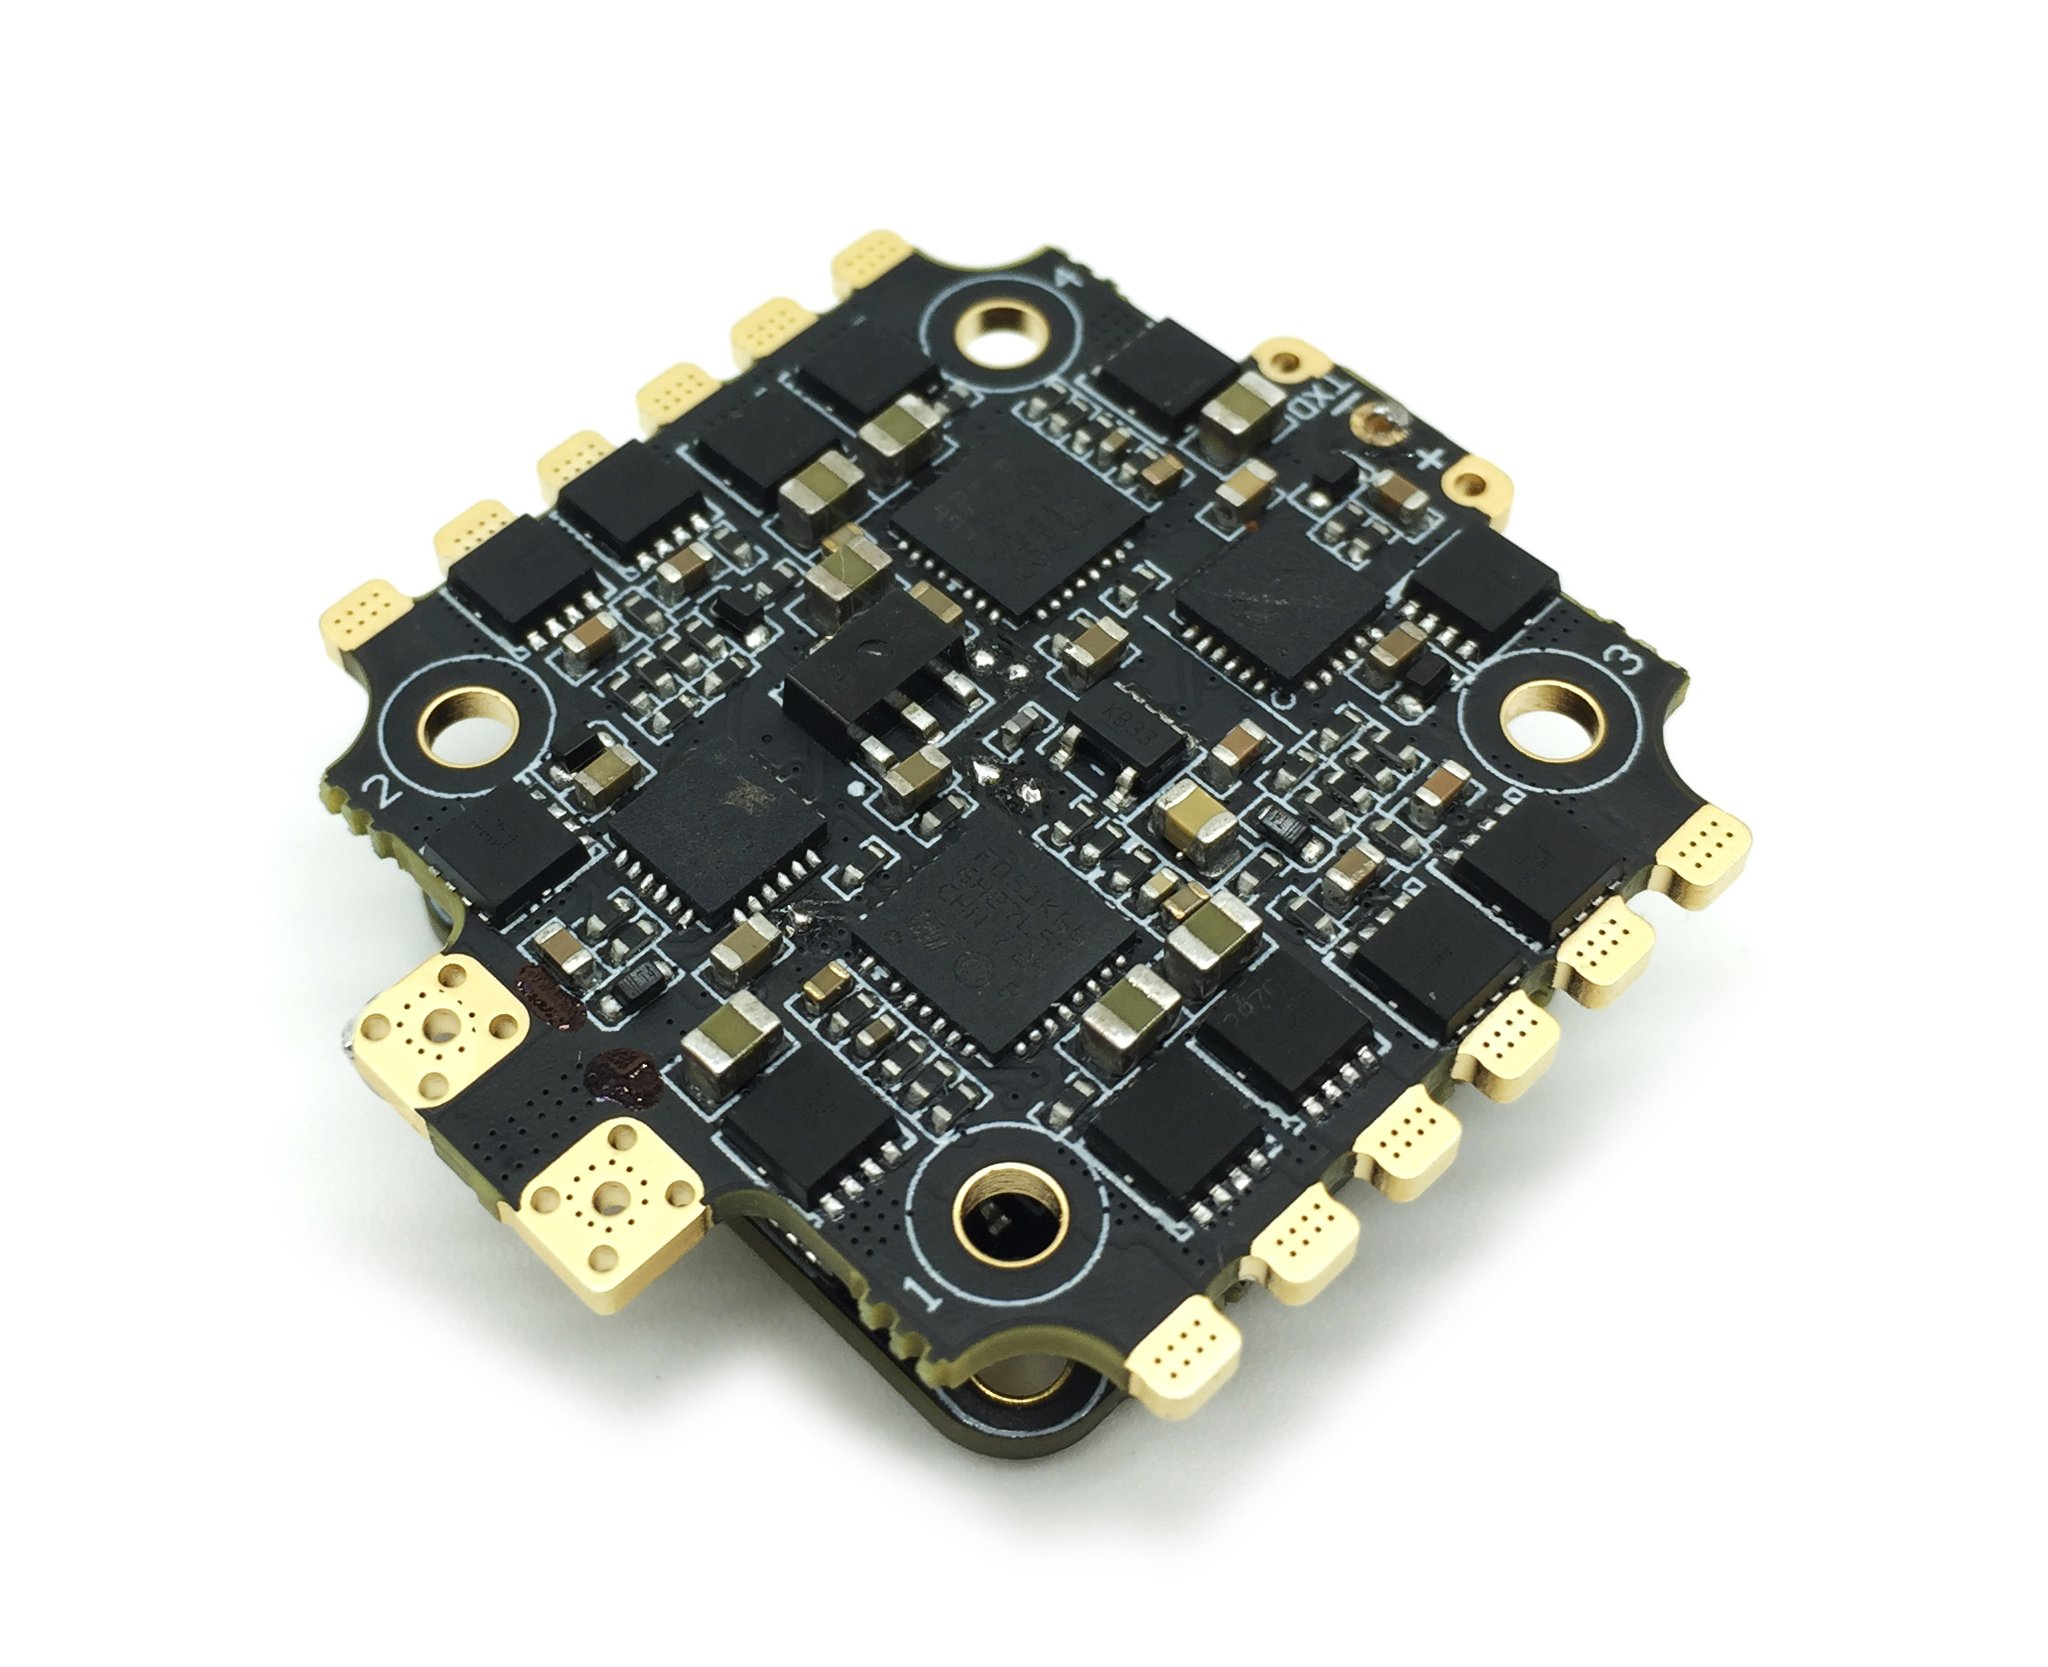 HGLRC DINOSHOT 40AMP 3-5S BLHELI32 4IN1 ESC DSHOT1200 FOR XJB F440